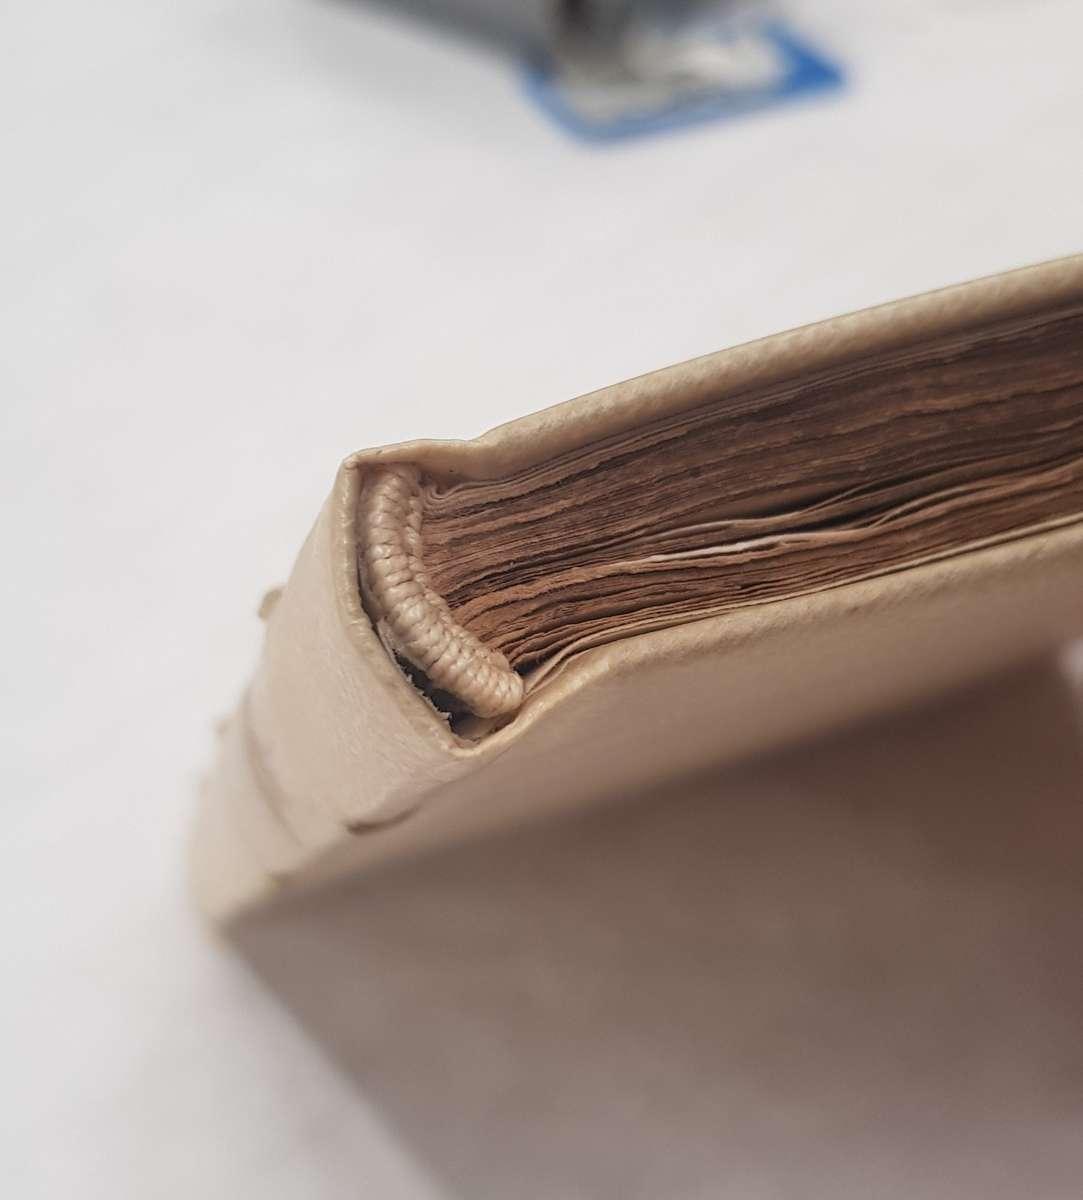 Hand sewn endband. ANMM Collection 00006056.